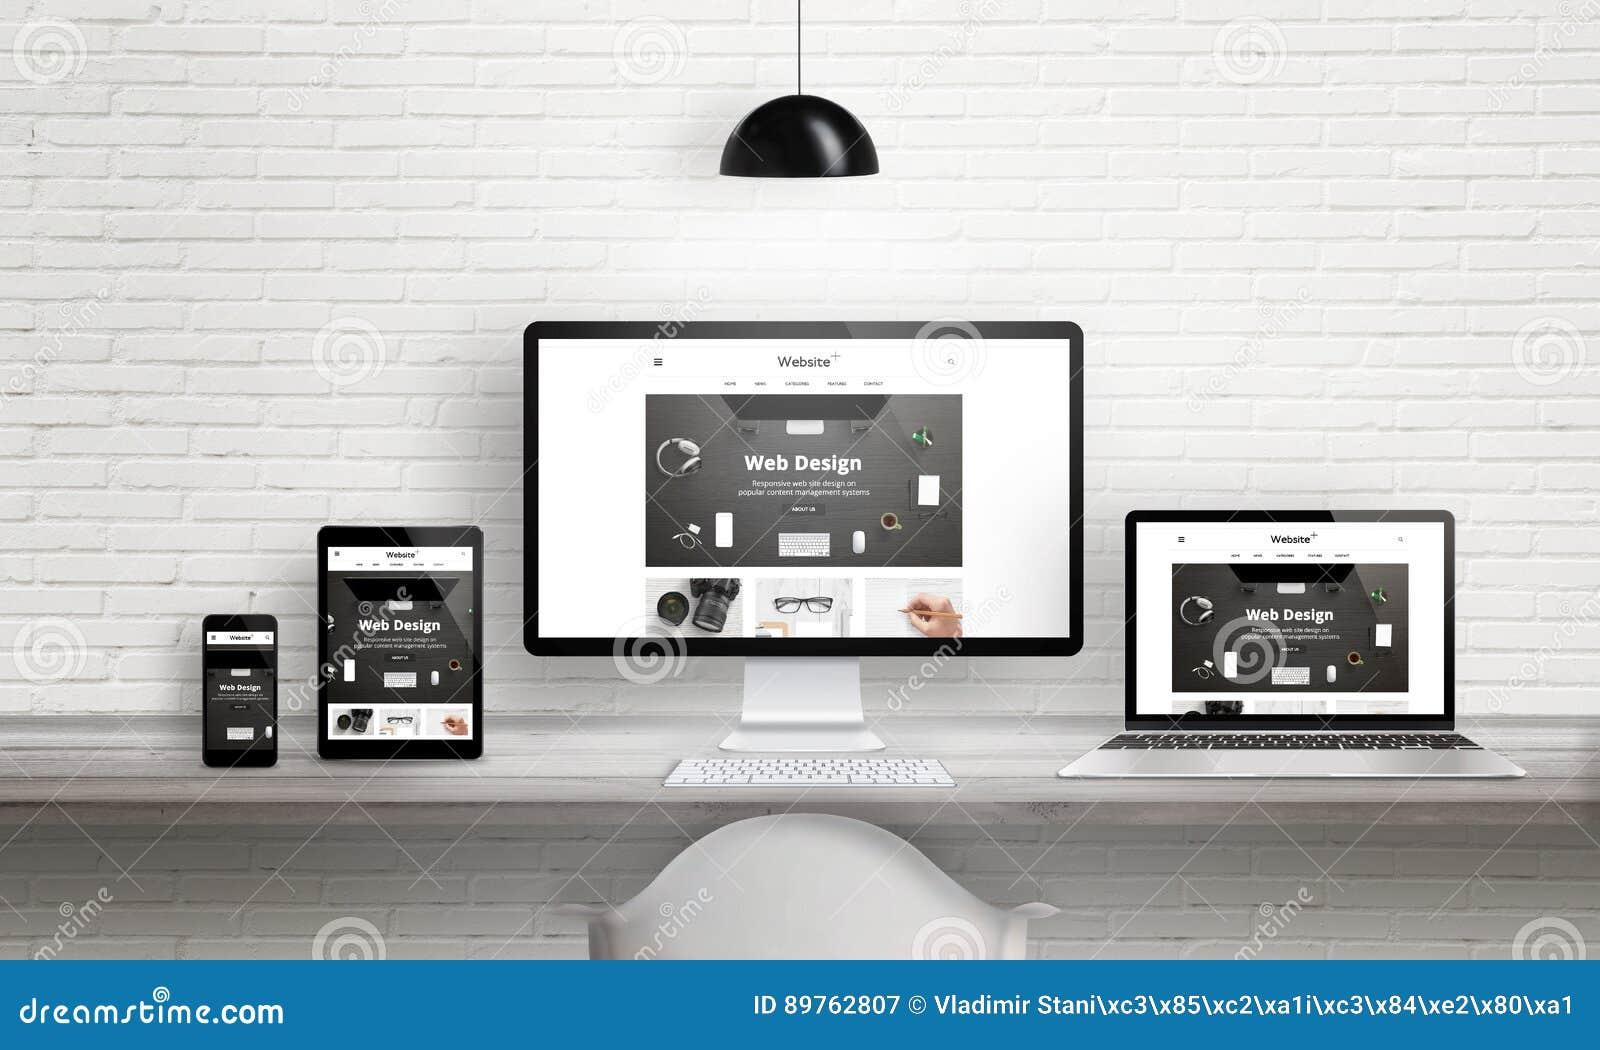 Creative Web Design Agency Presentation On Multiple Devices